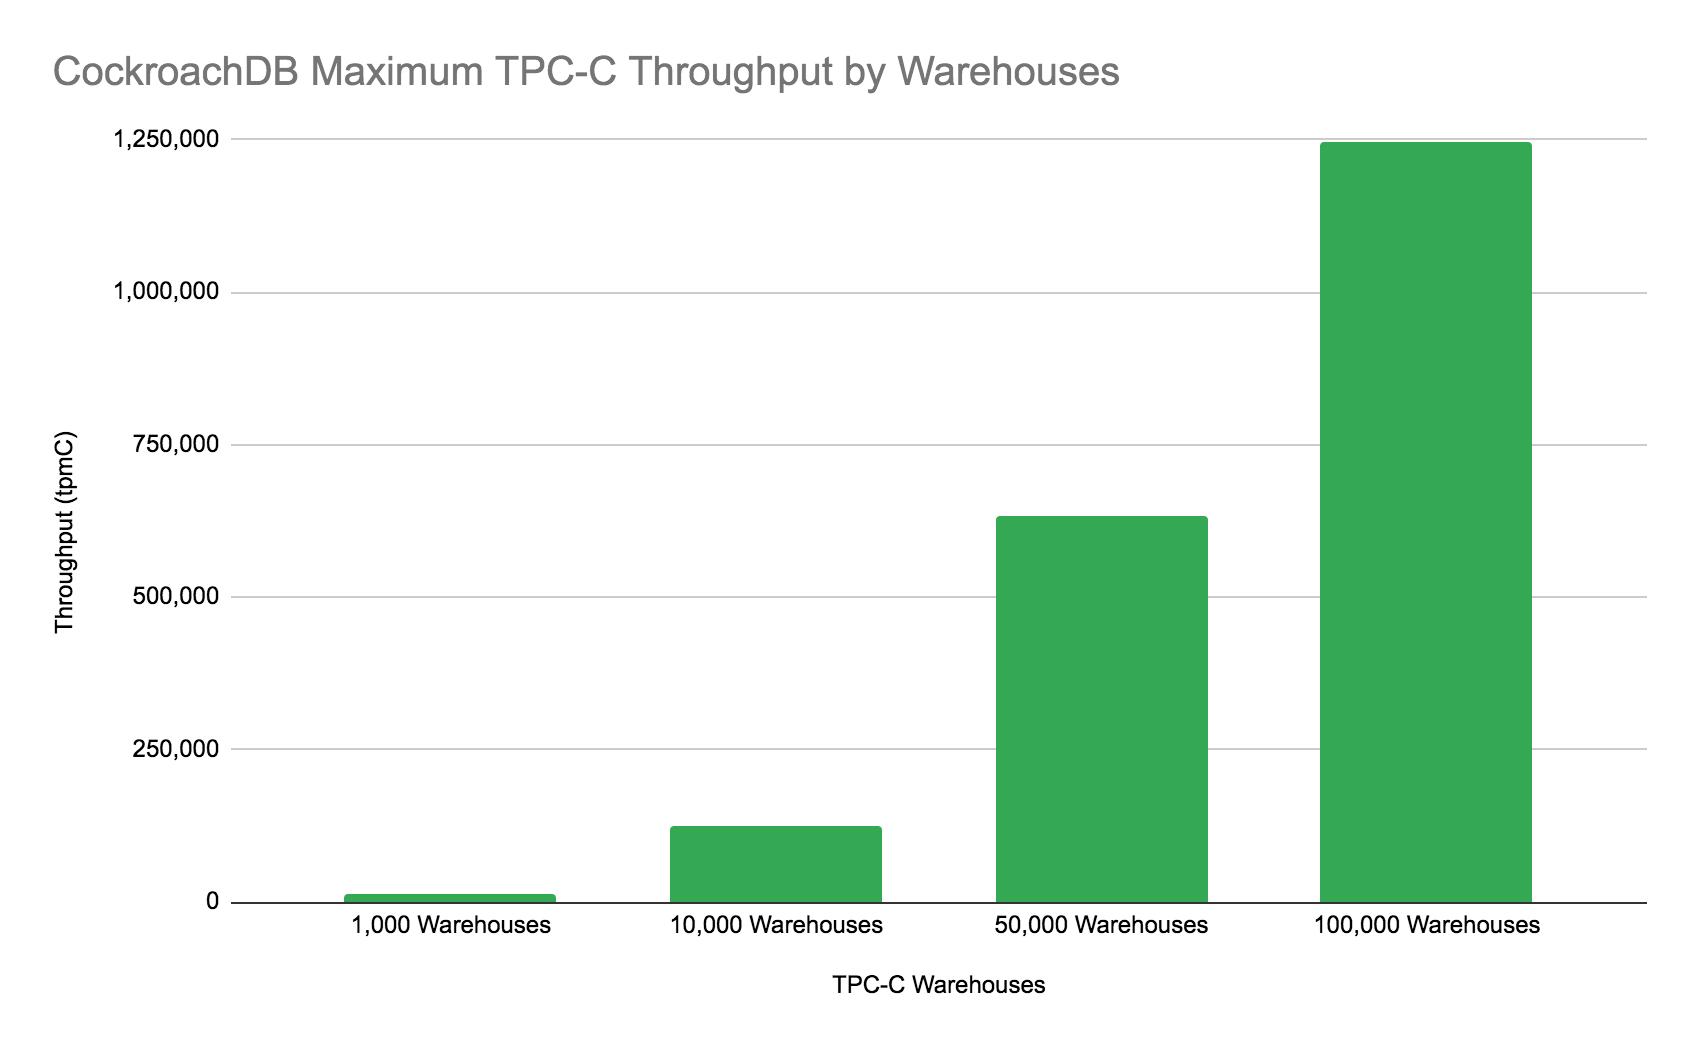 TPC-C 100,000